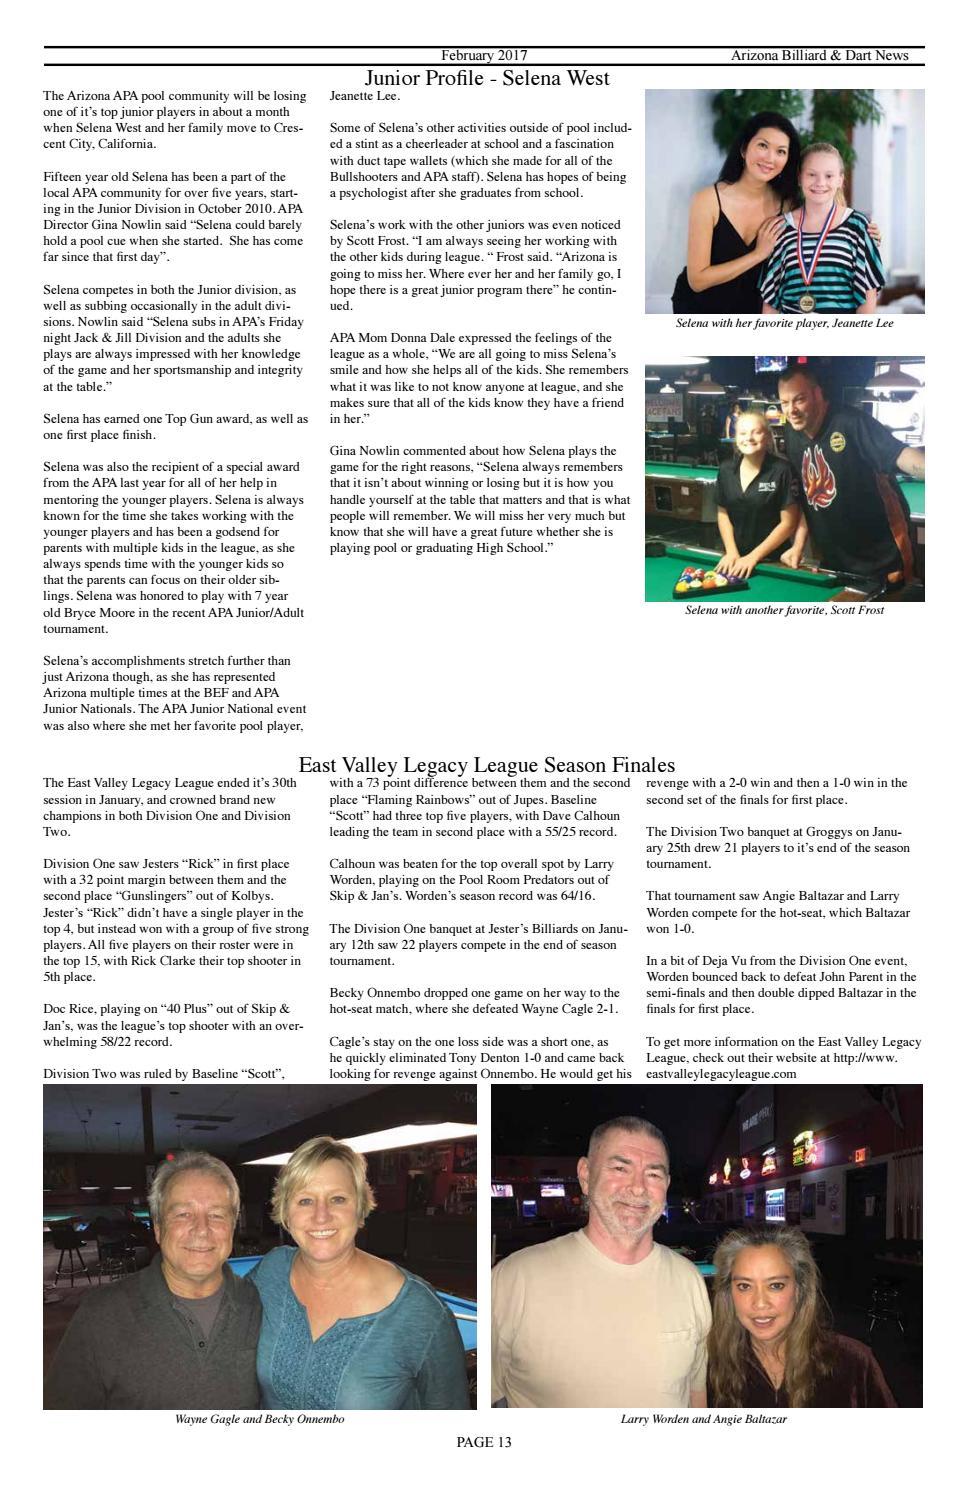 Az Billiard & Dart News February 2017 by Mike Howerton - issuu